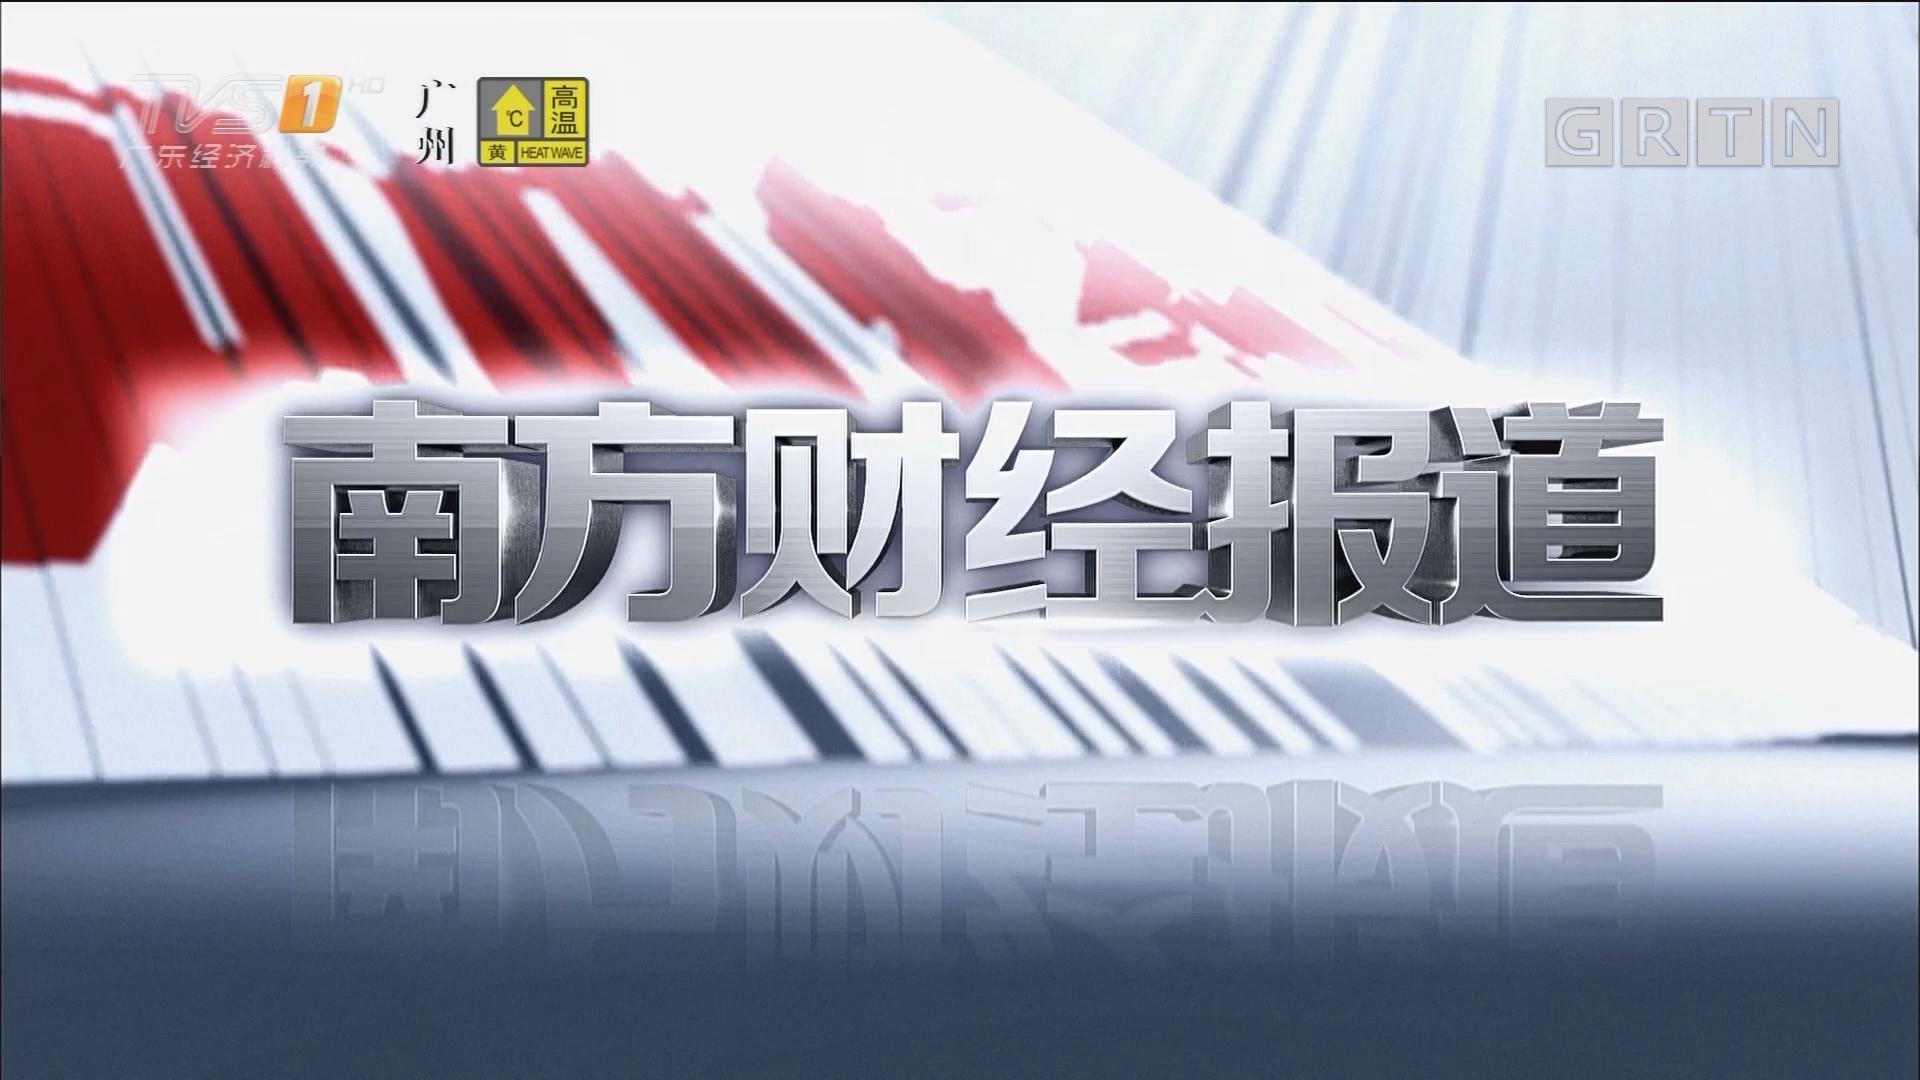 [HD][2018-07-12]南方财经报道:2018中国互联网大会:聚焦智慧生活 数字经济等领域